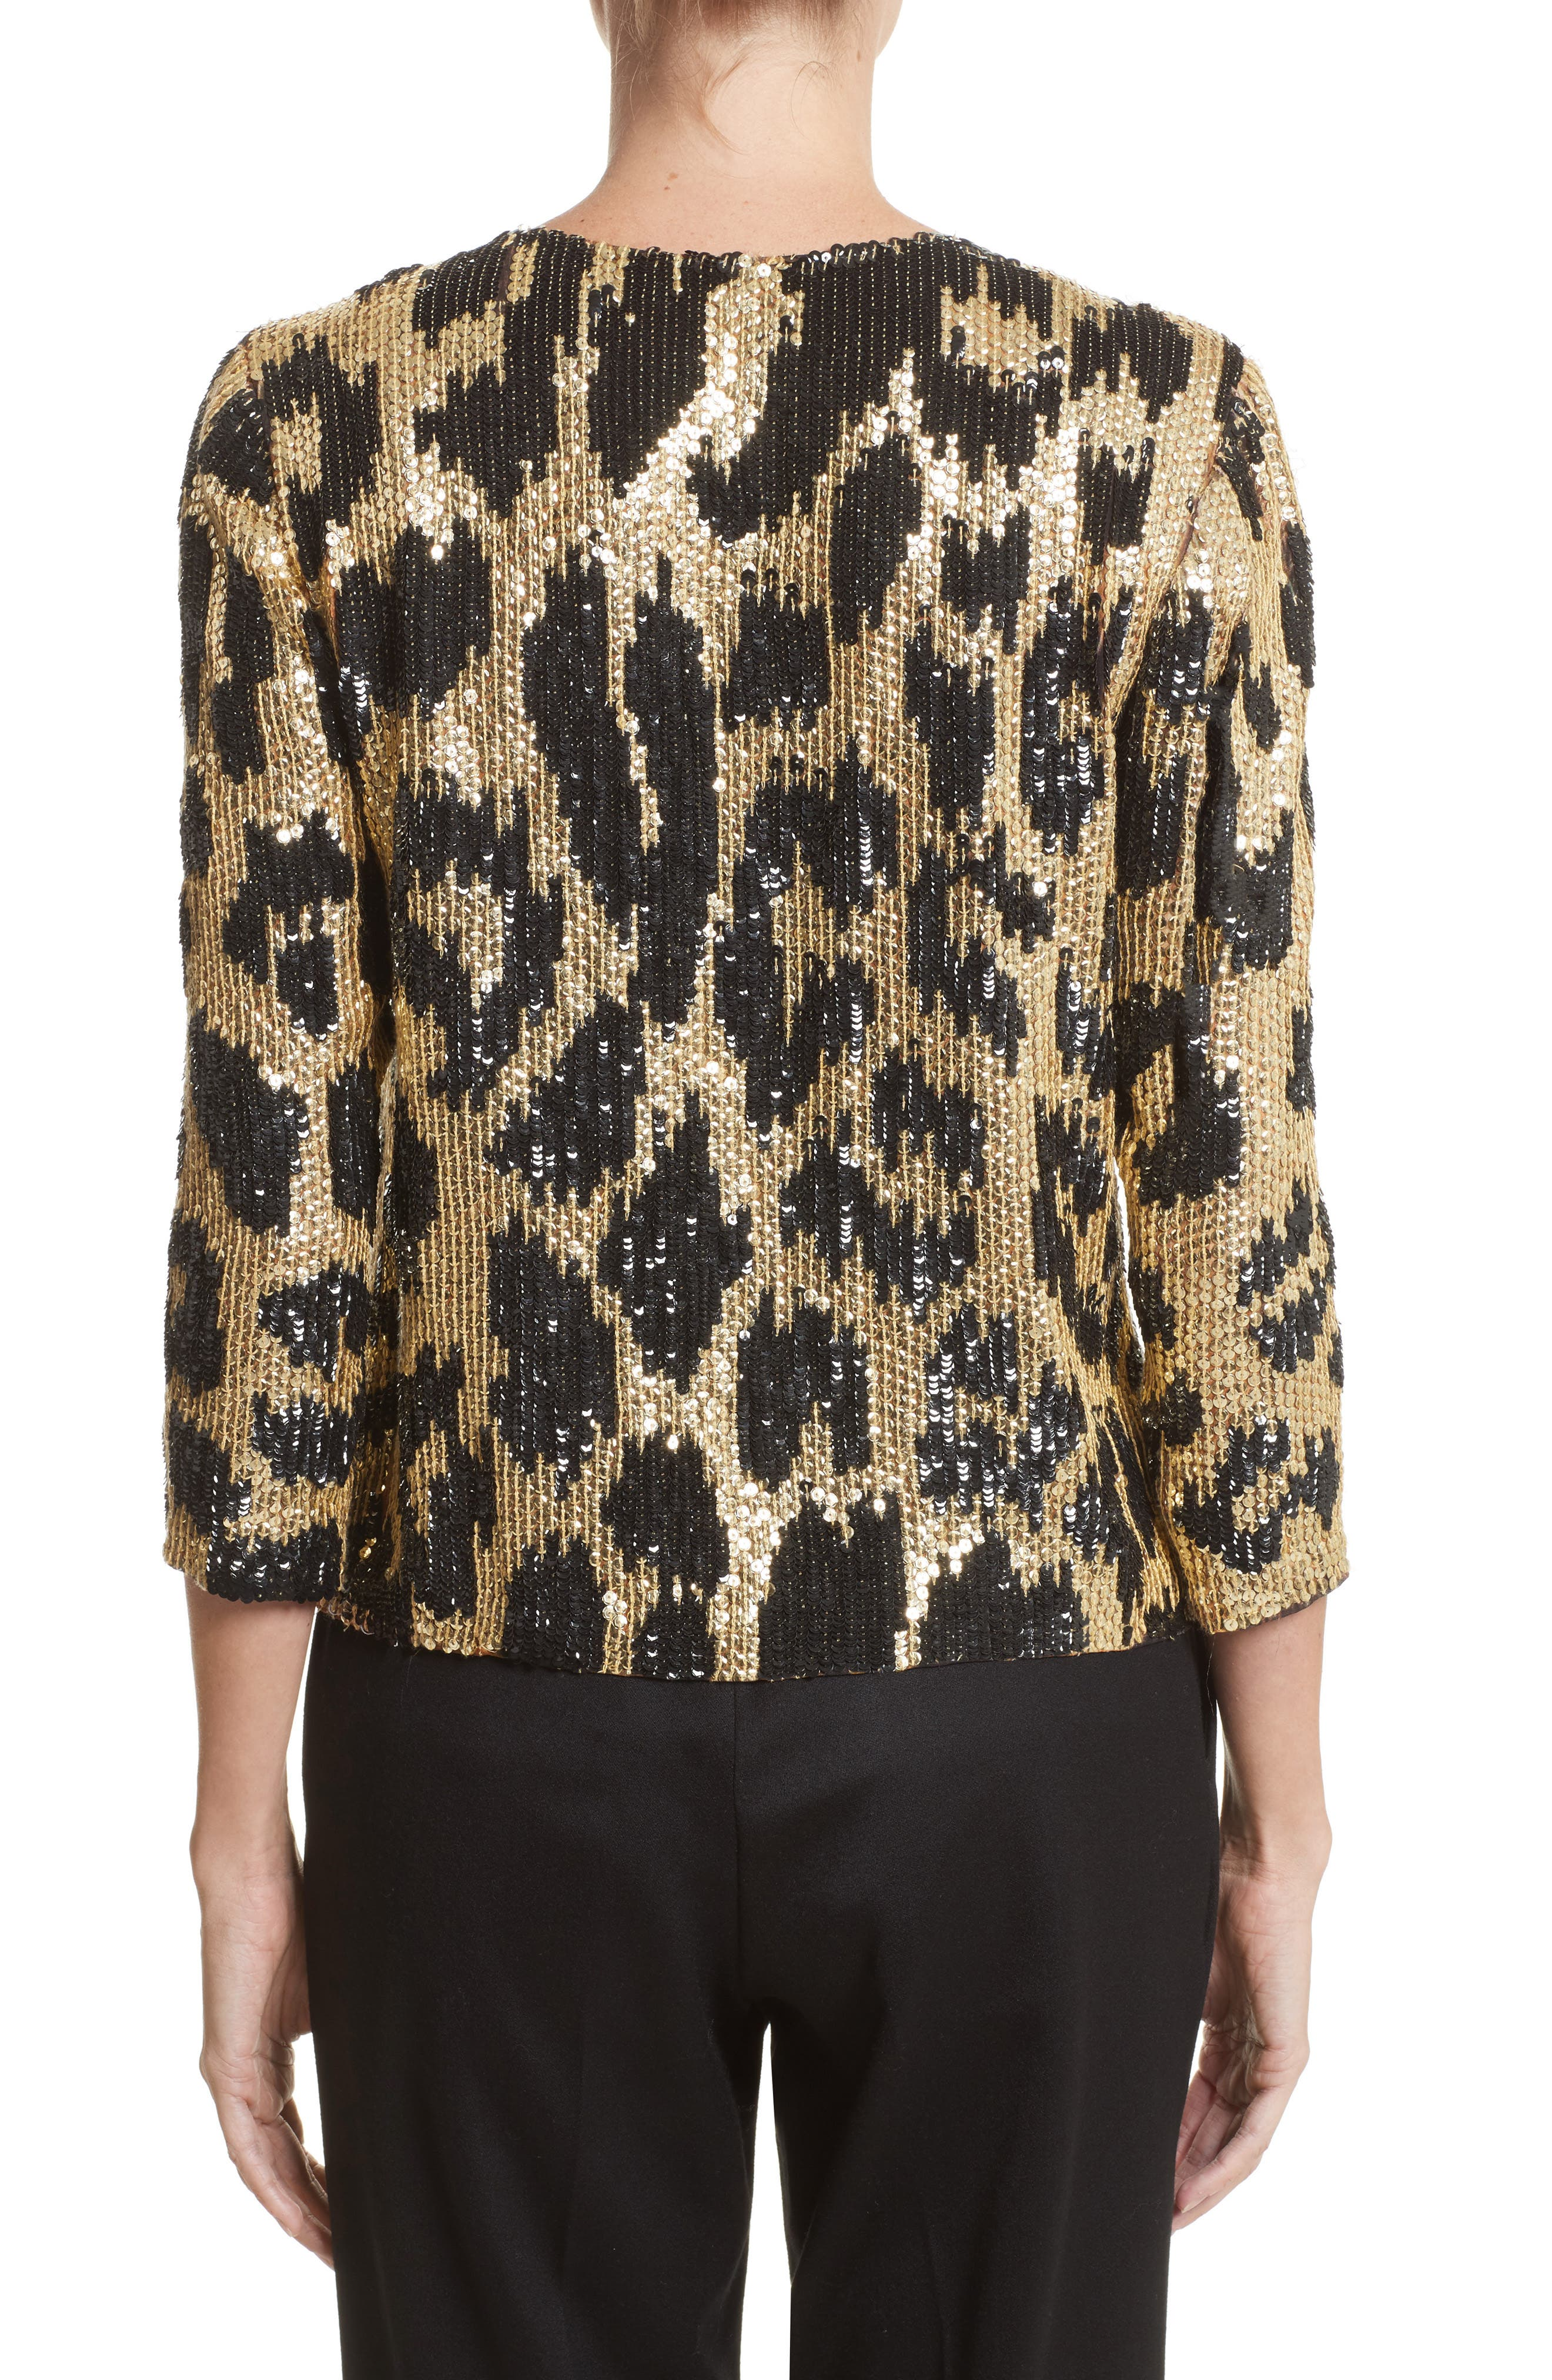 Cheetah Print Sequin Jacket,                             Alternate thumbnail 2, color,                             Black/ Gold